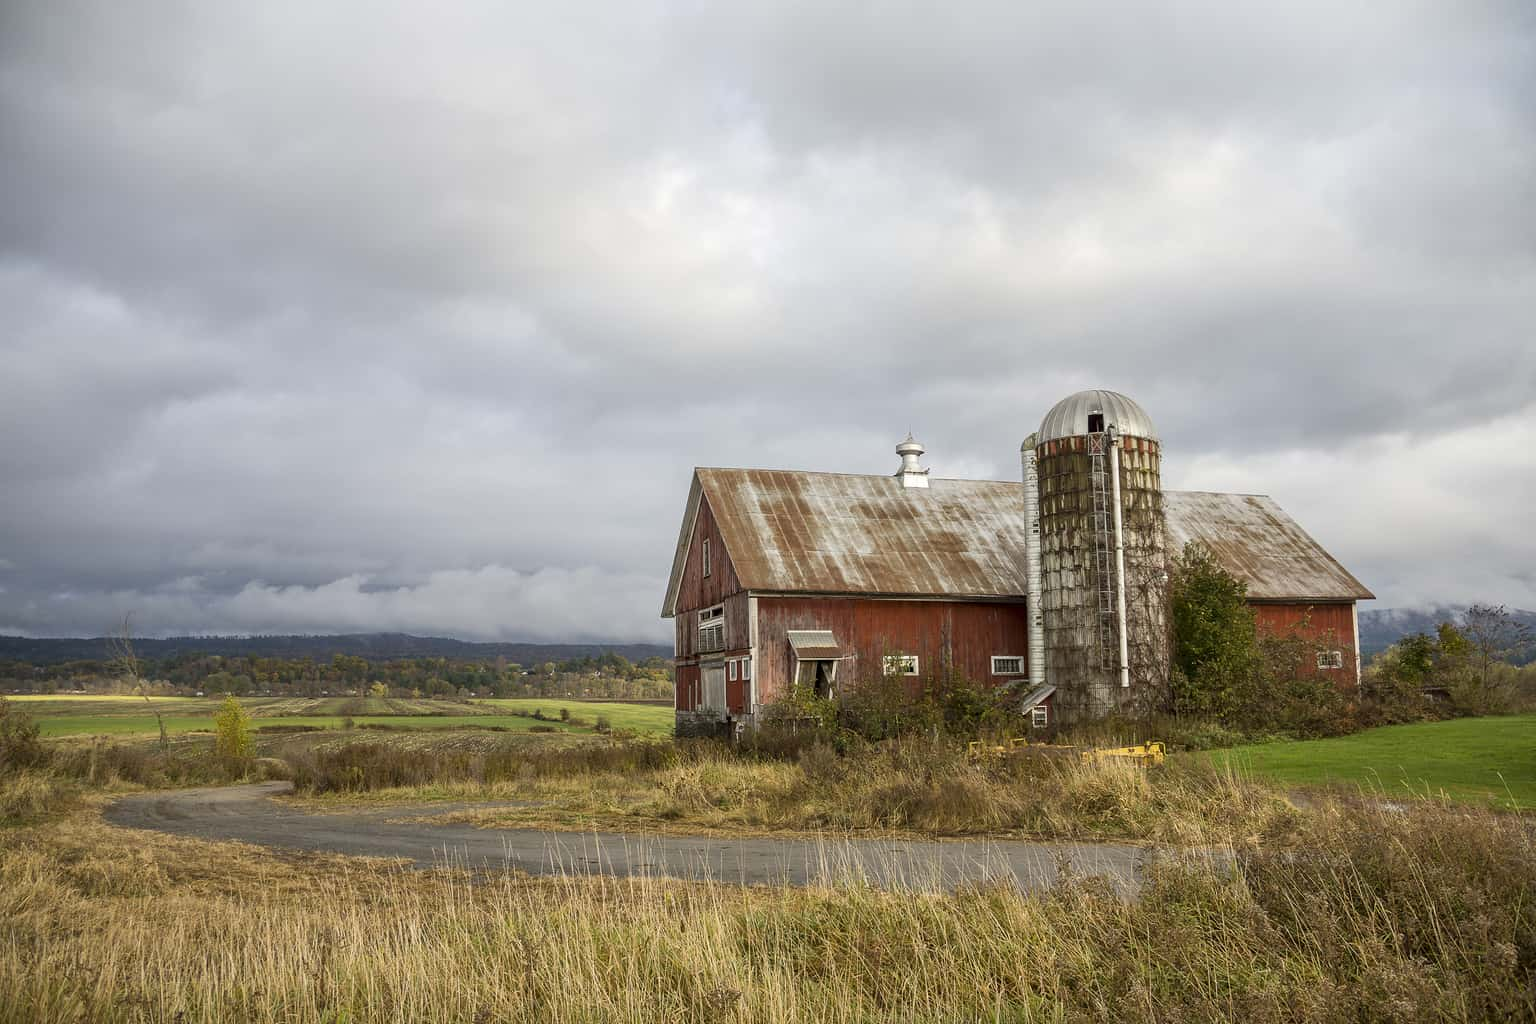 Farm in Fall, Newbury VT